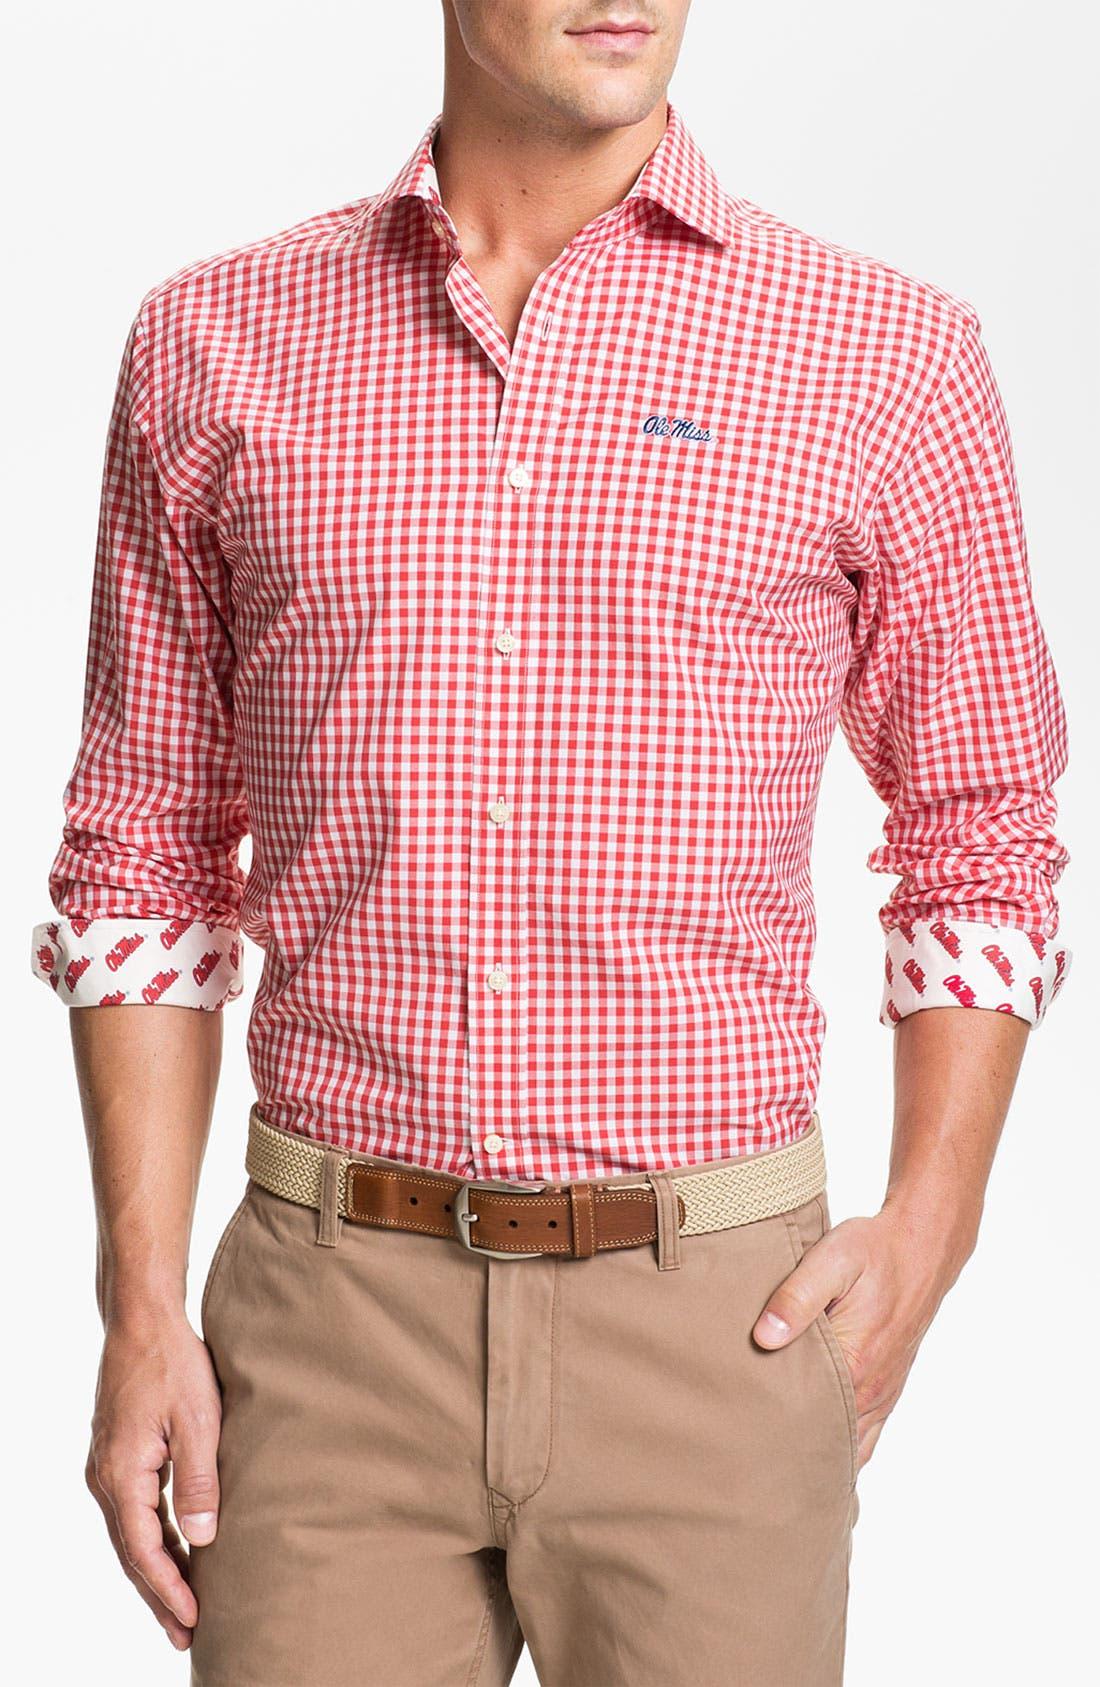 Alternate Image 1 Selected - Thomas Dean 'University of Mississippi' Gingham Sport Shirt